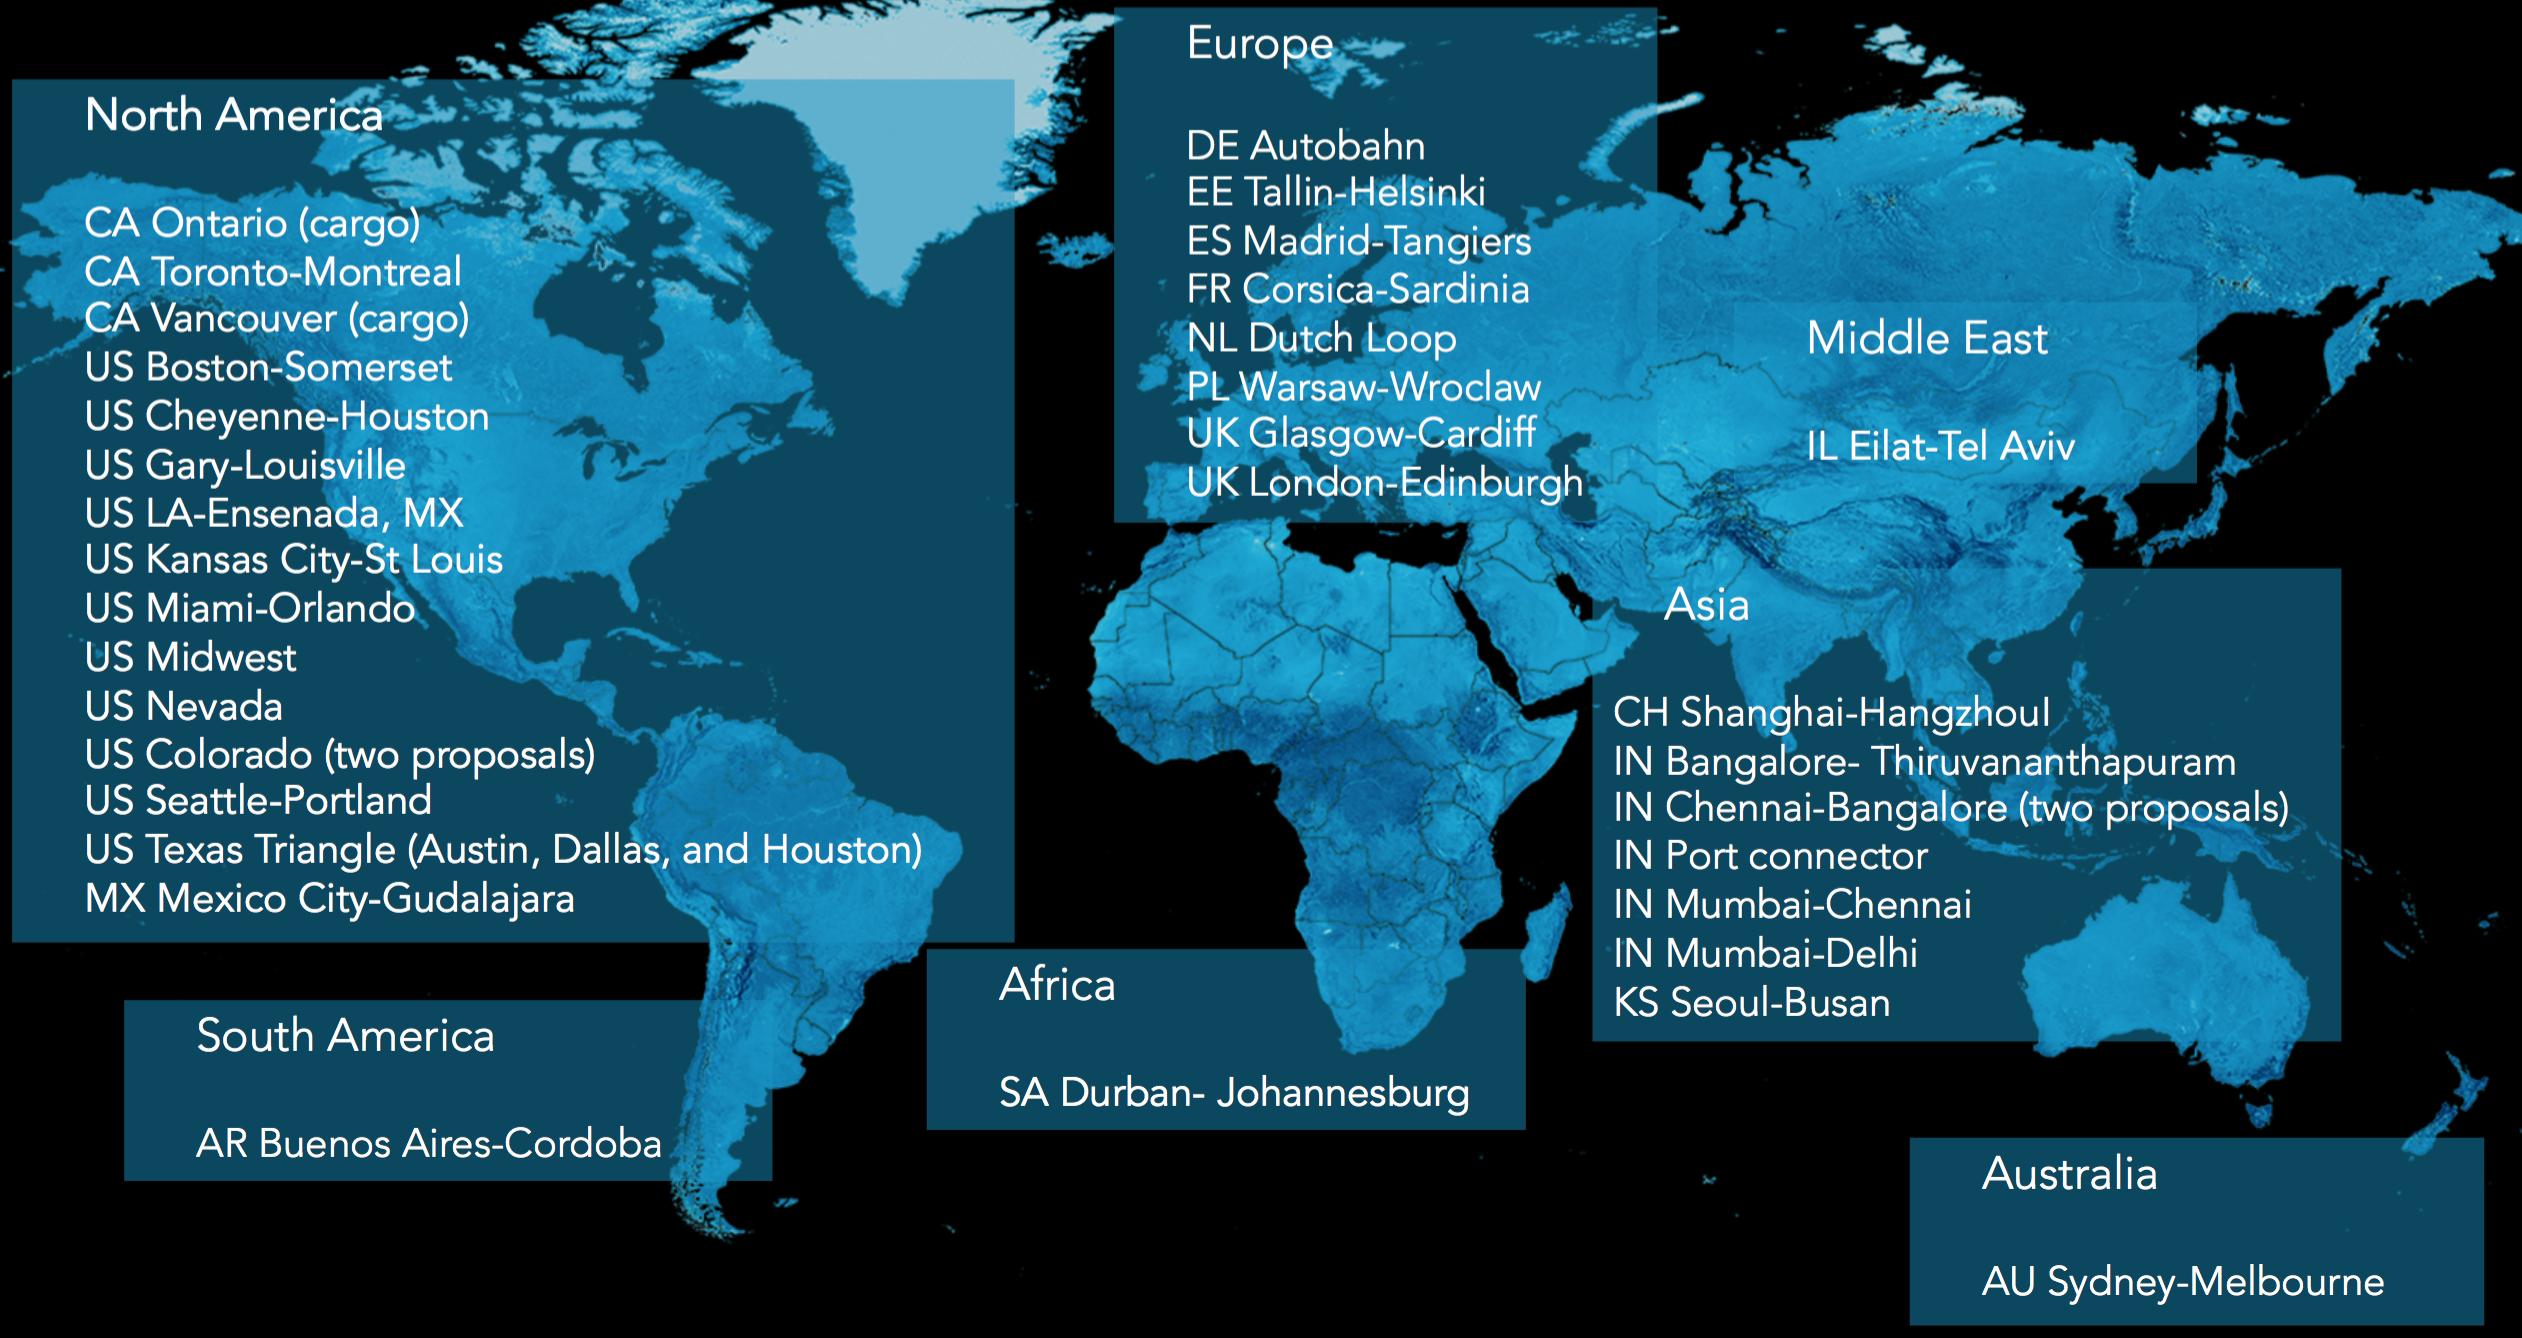 The finalists released by Hyperloop One, by region.